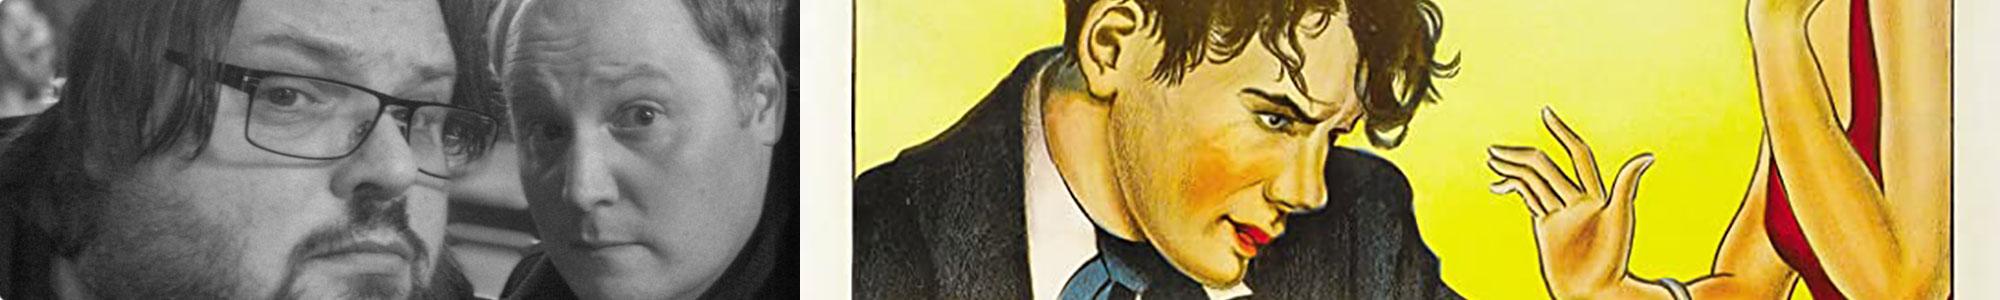 Scarface Banner